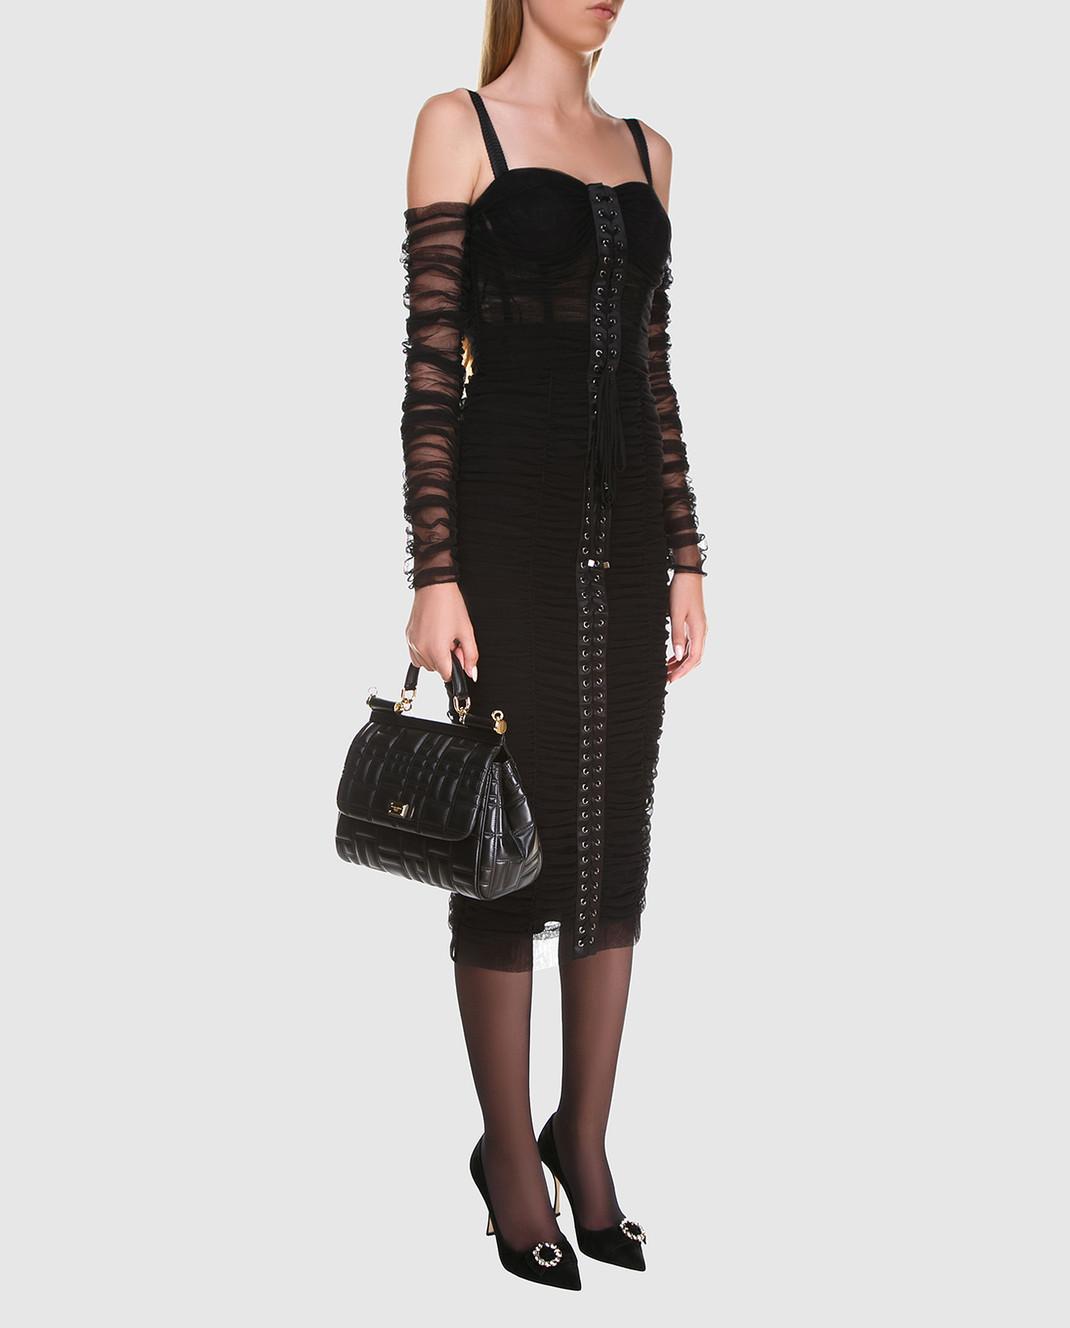 Dolce&Gabbana Черное платье F6A9QTFLEAA изображение 3